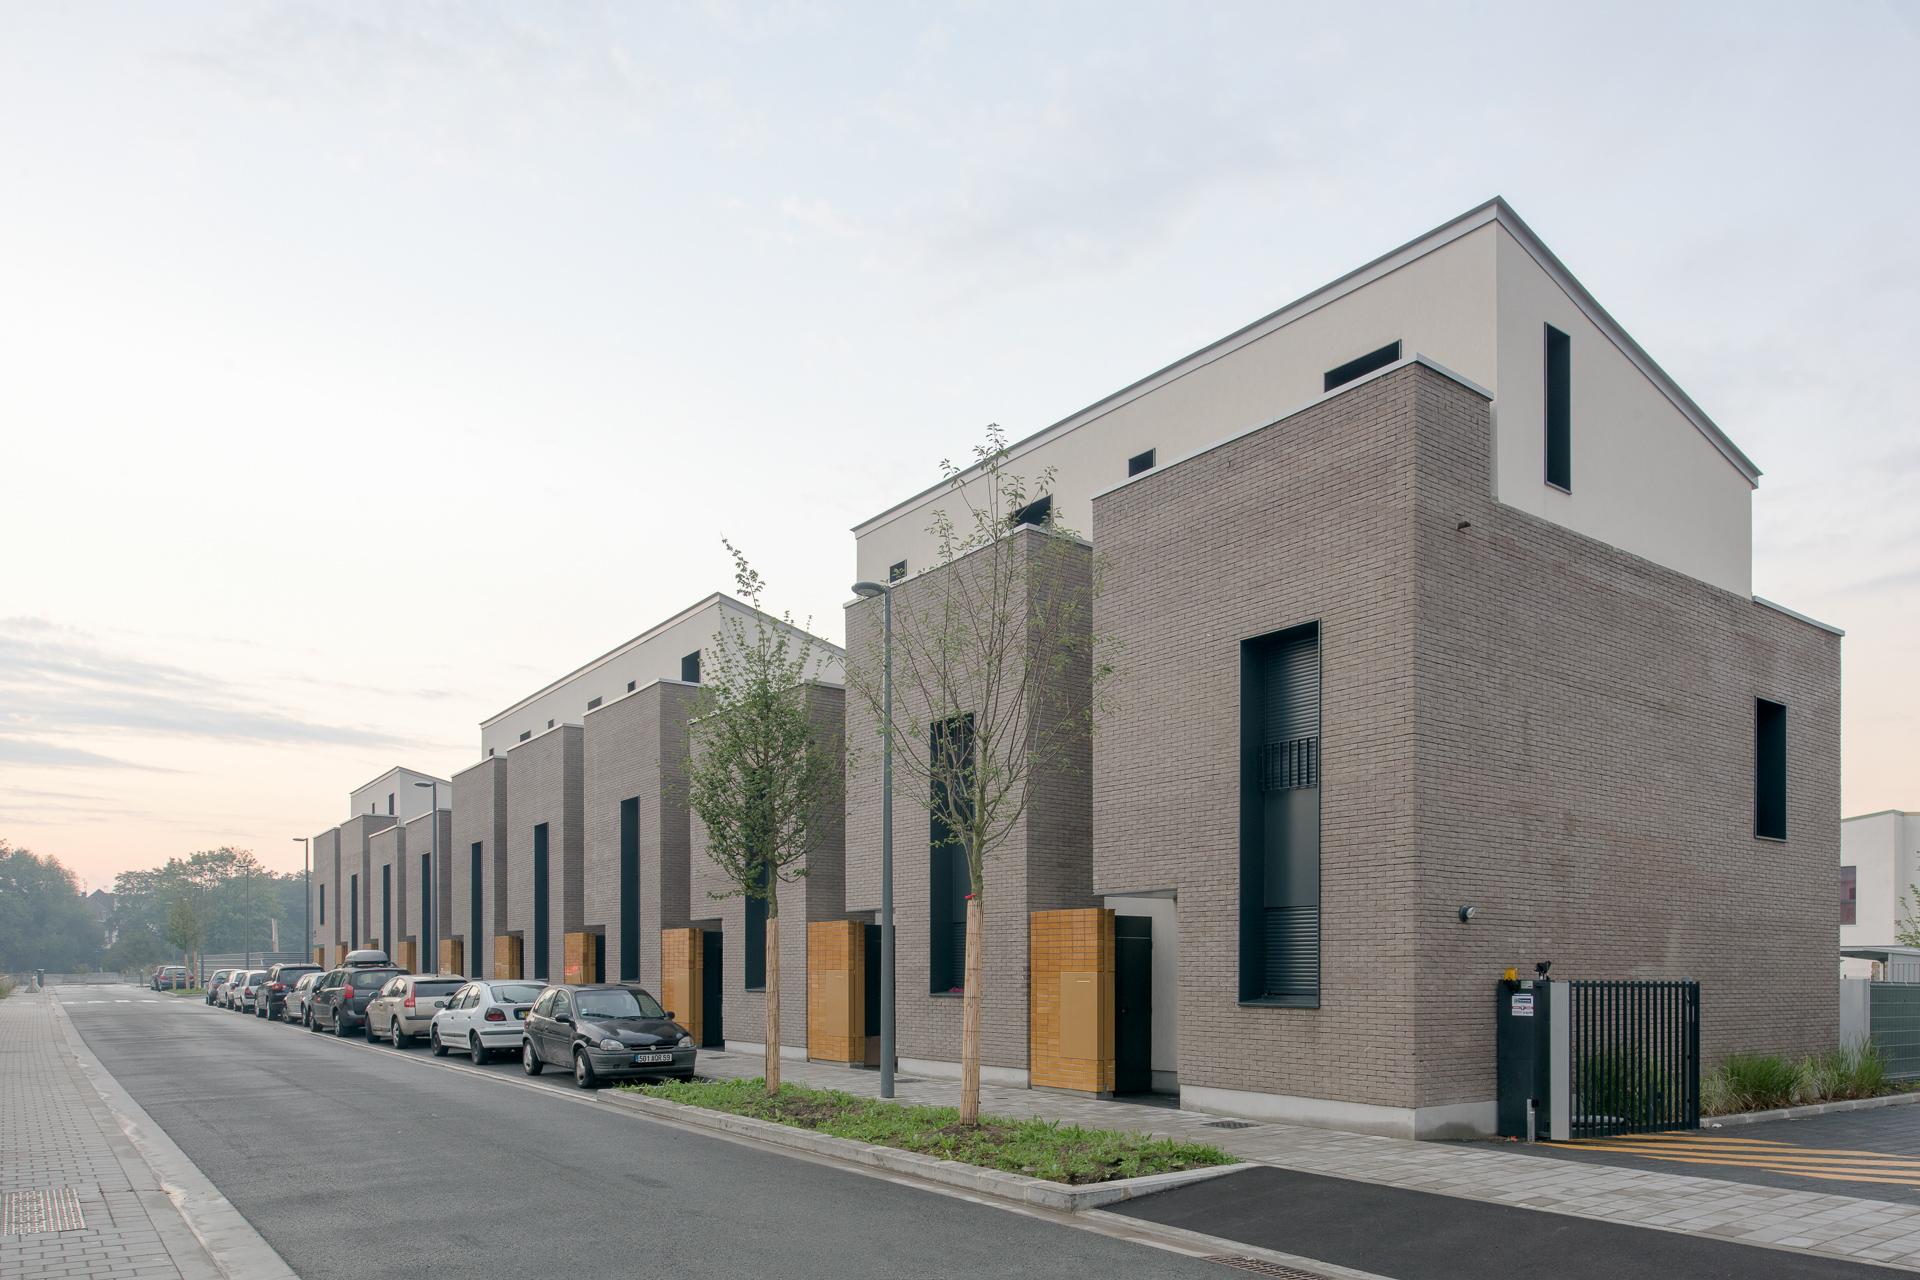 Martin argyroglo photographe for Architecte marseille maison individuelle